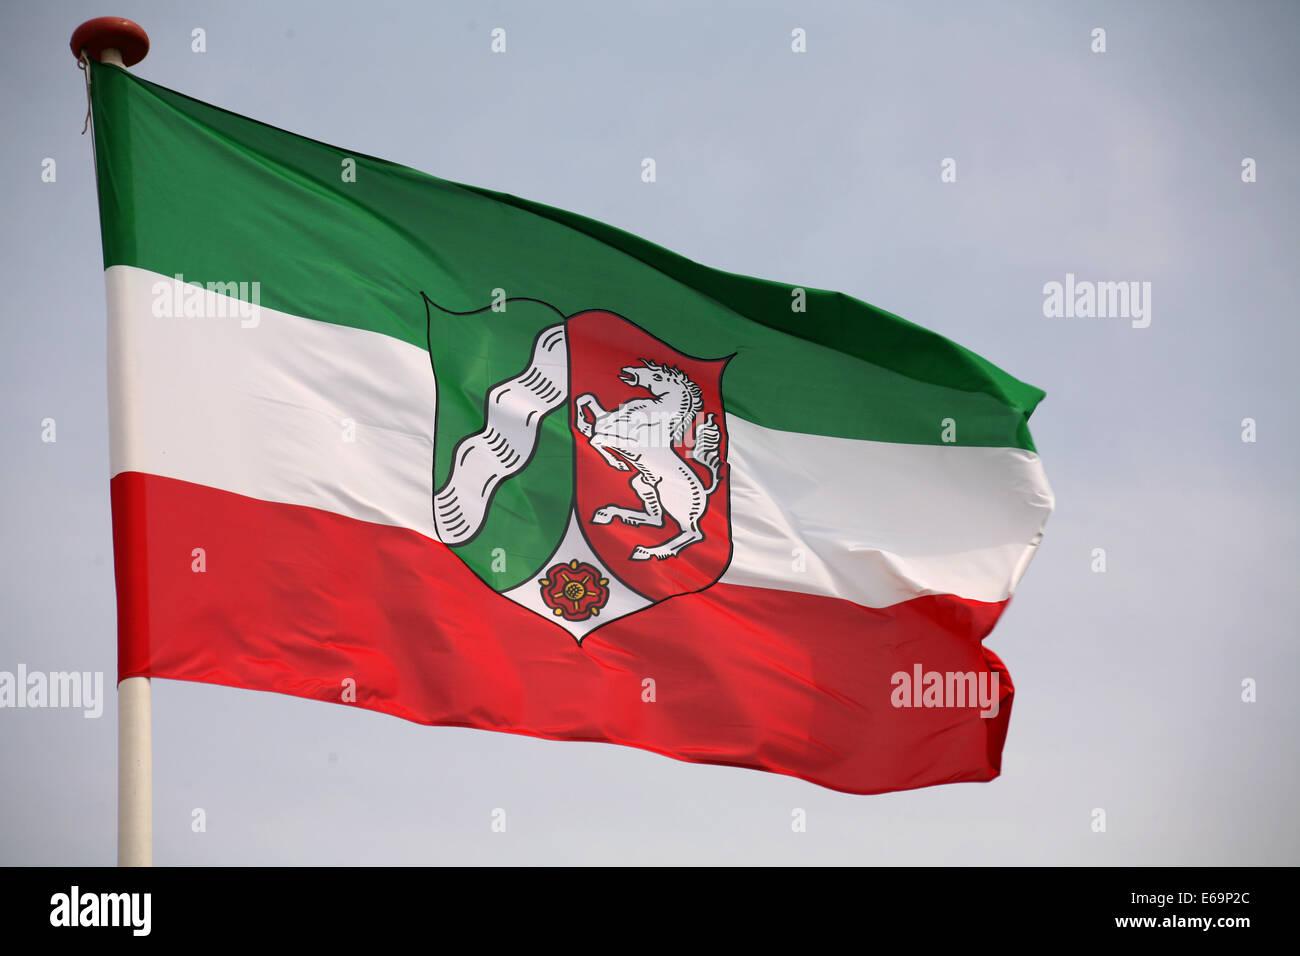 flag,state,north rhine westphalia - Stock Image